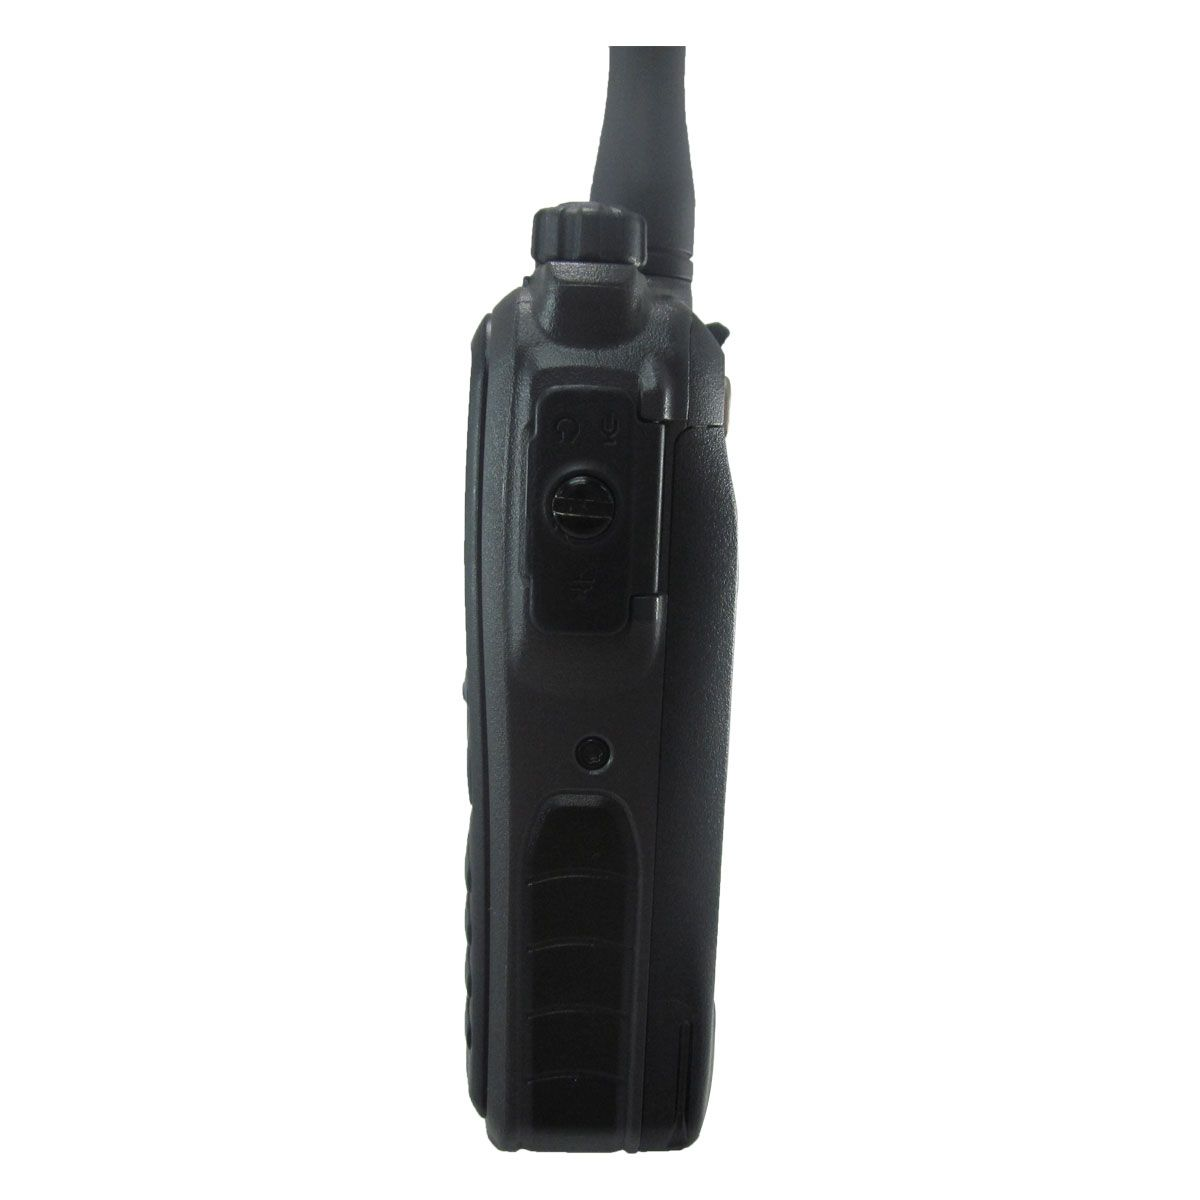 Radio Hytera PD786 Digital PD786-U UHF 400-470 MHz